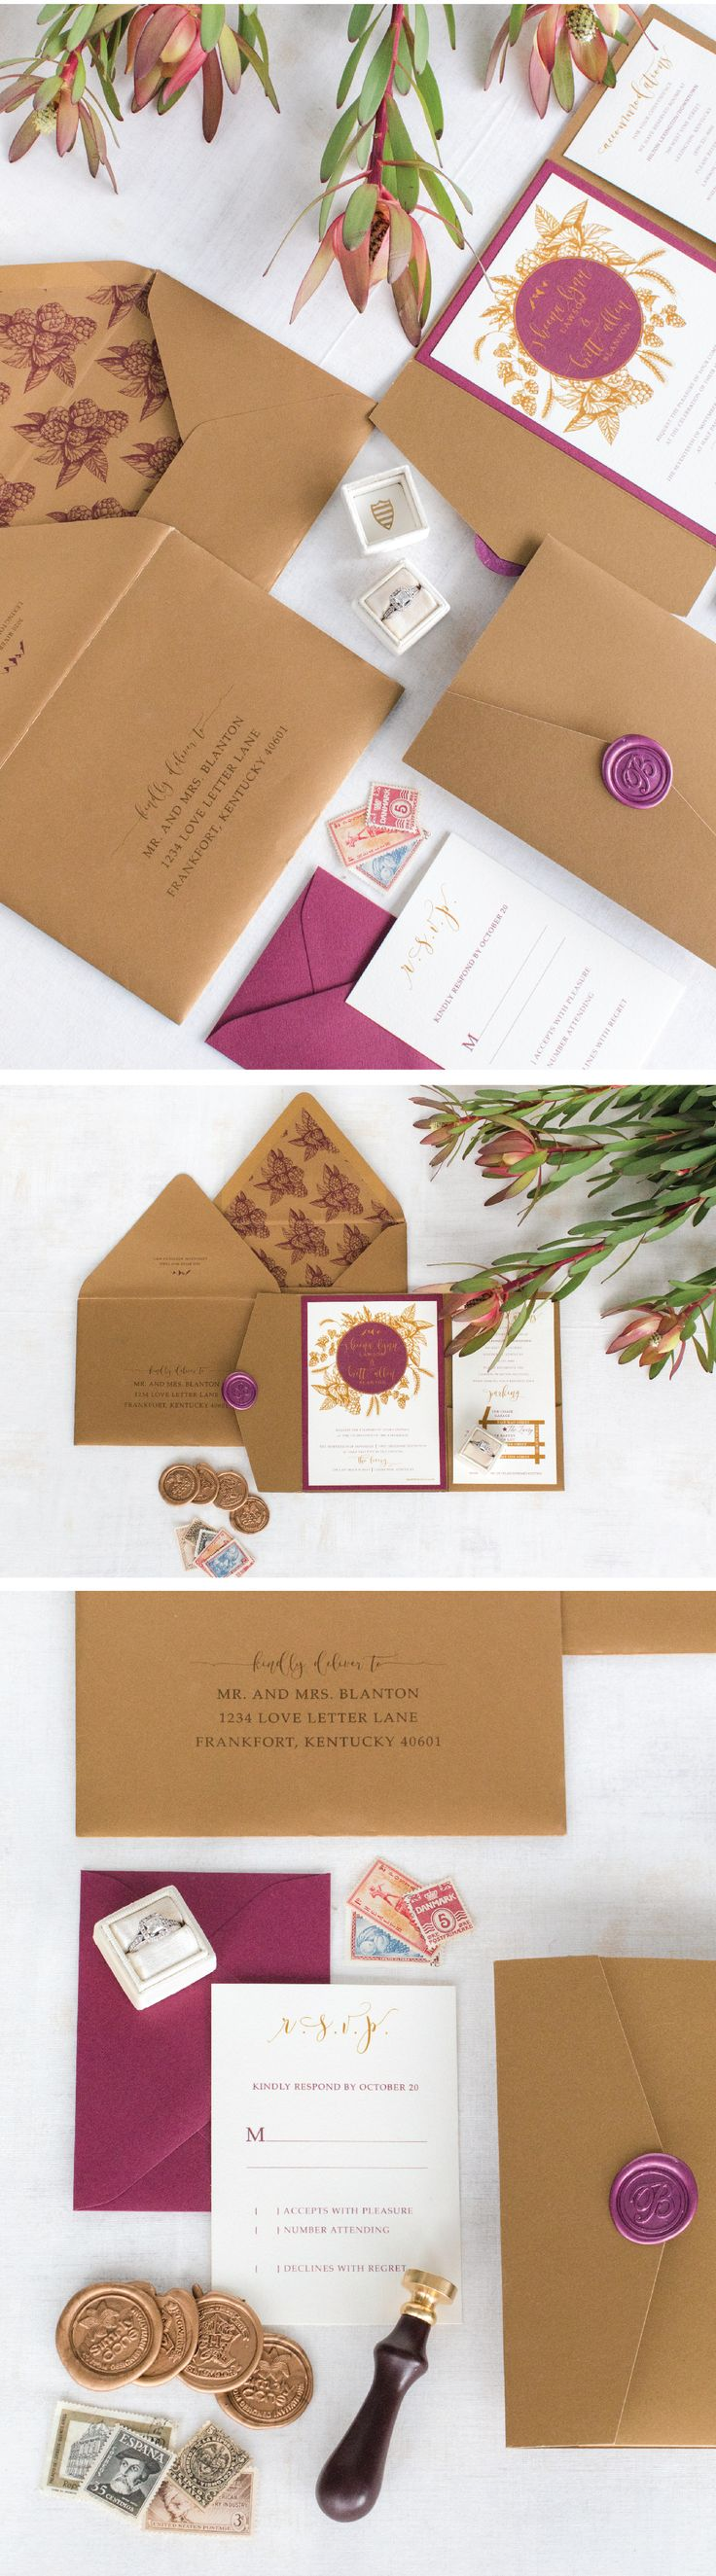 Custom Wedding Invitations that tell your love